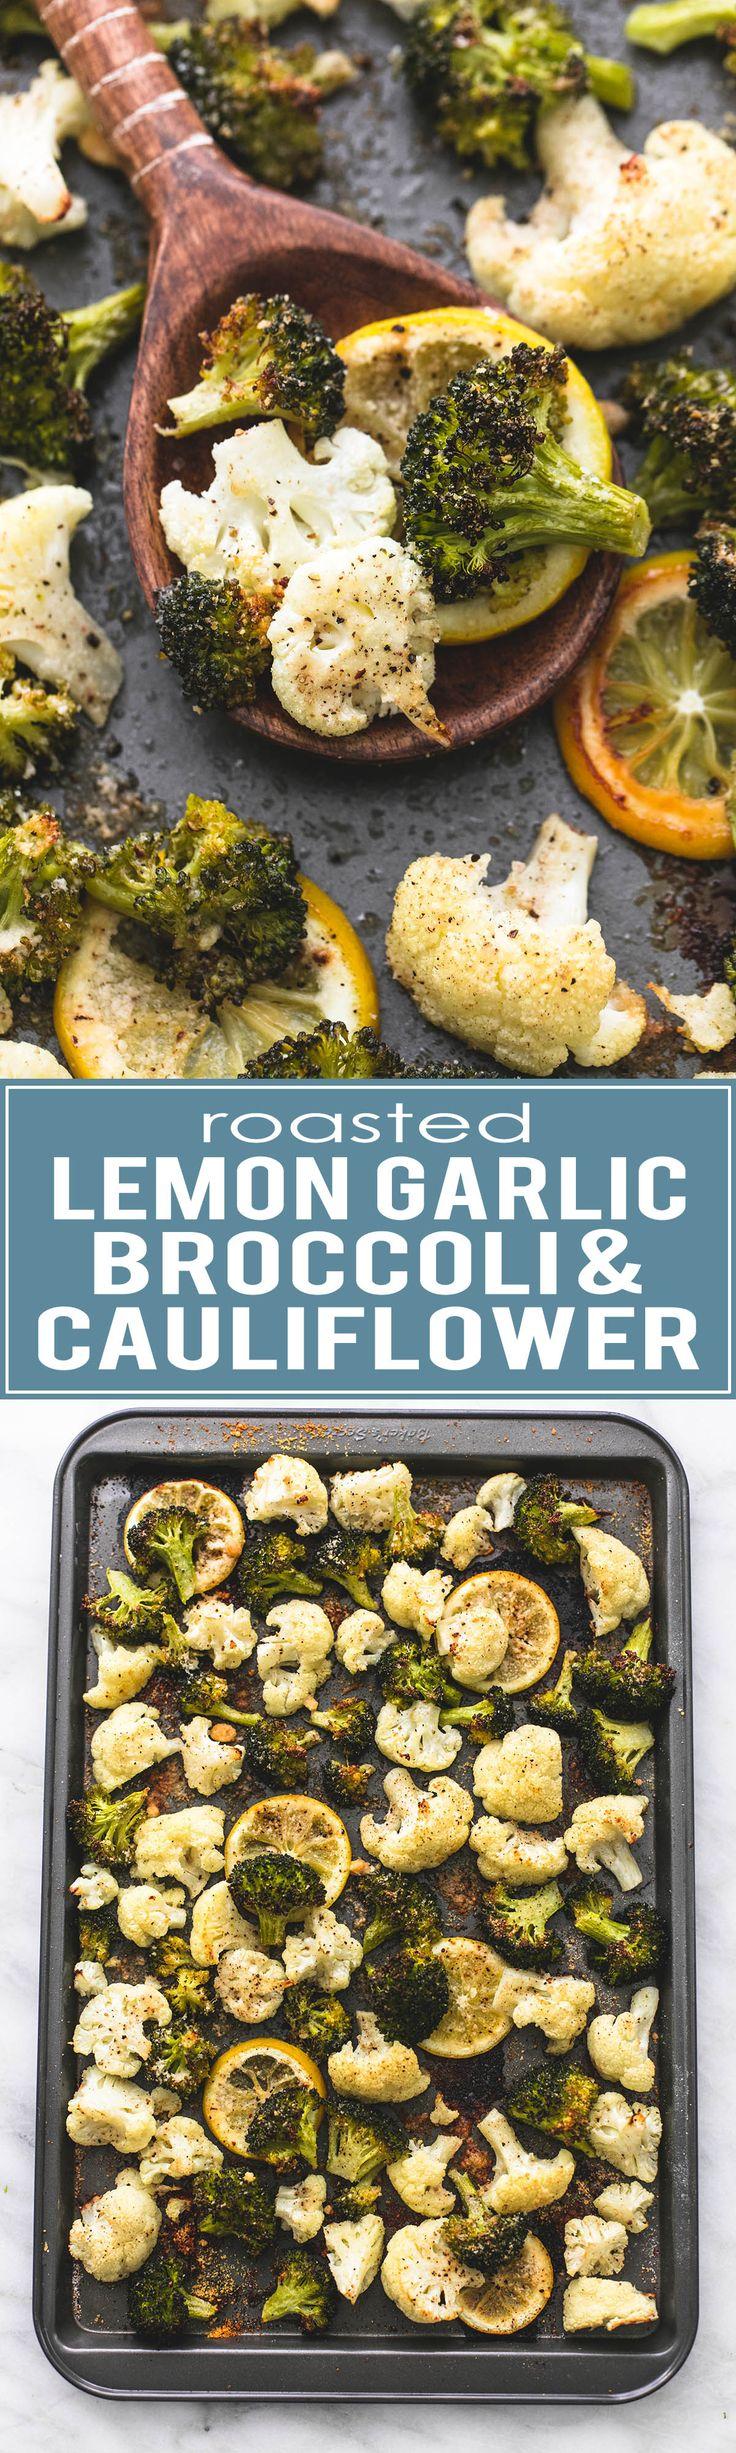 Easy and healthy One Pan Roasted Lemon Garlic Broccoli & Cauliflower | lecremedelacrumb.com